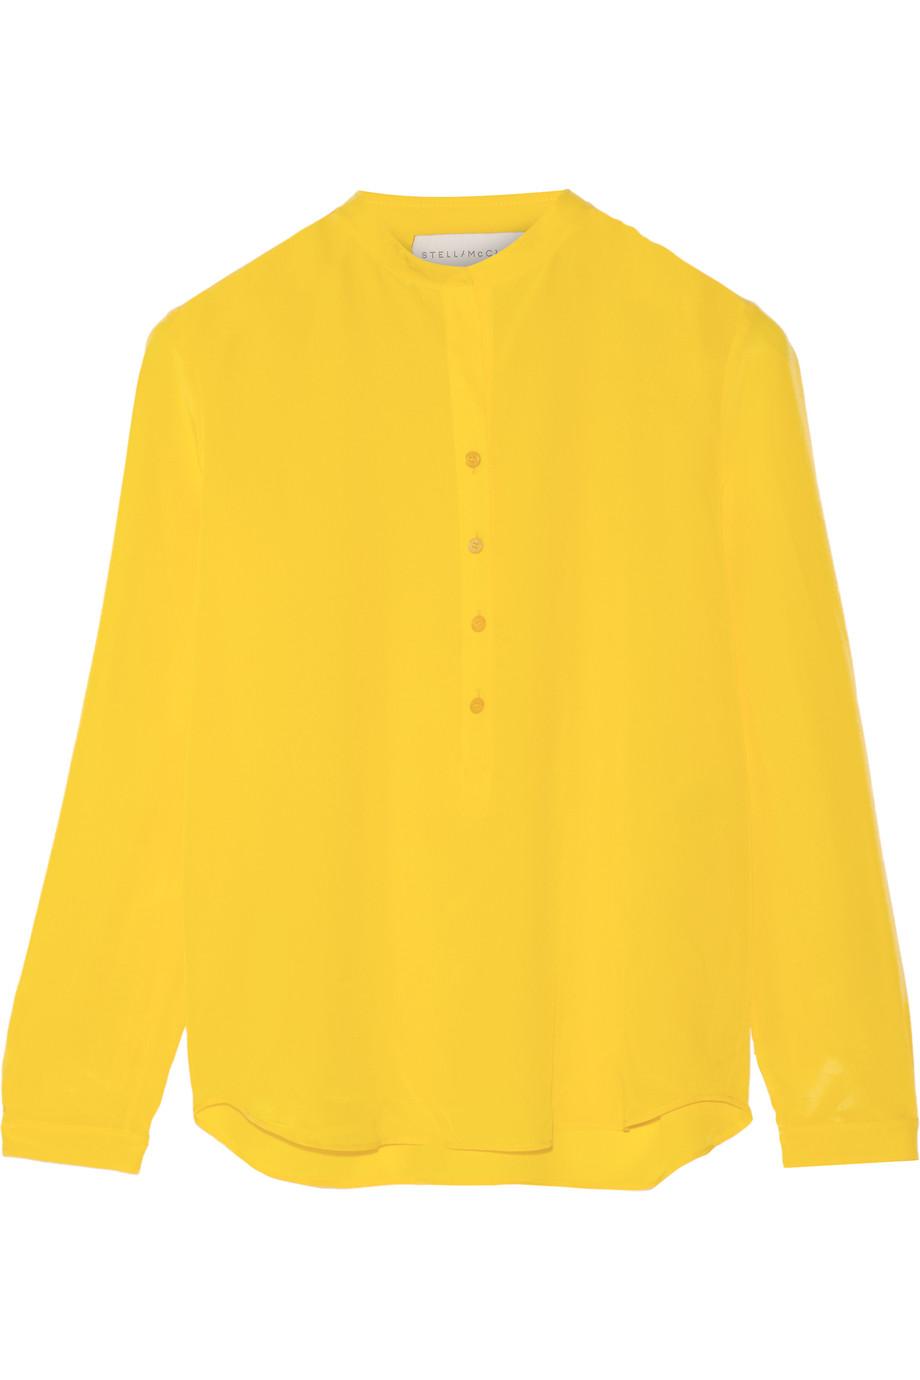 Stella Mccartney Eva Silk Crepe De Chine Blouse, Yellow, Women's, Size: 44